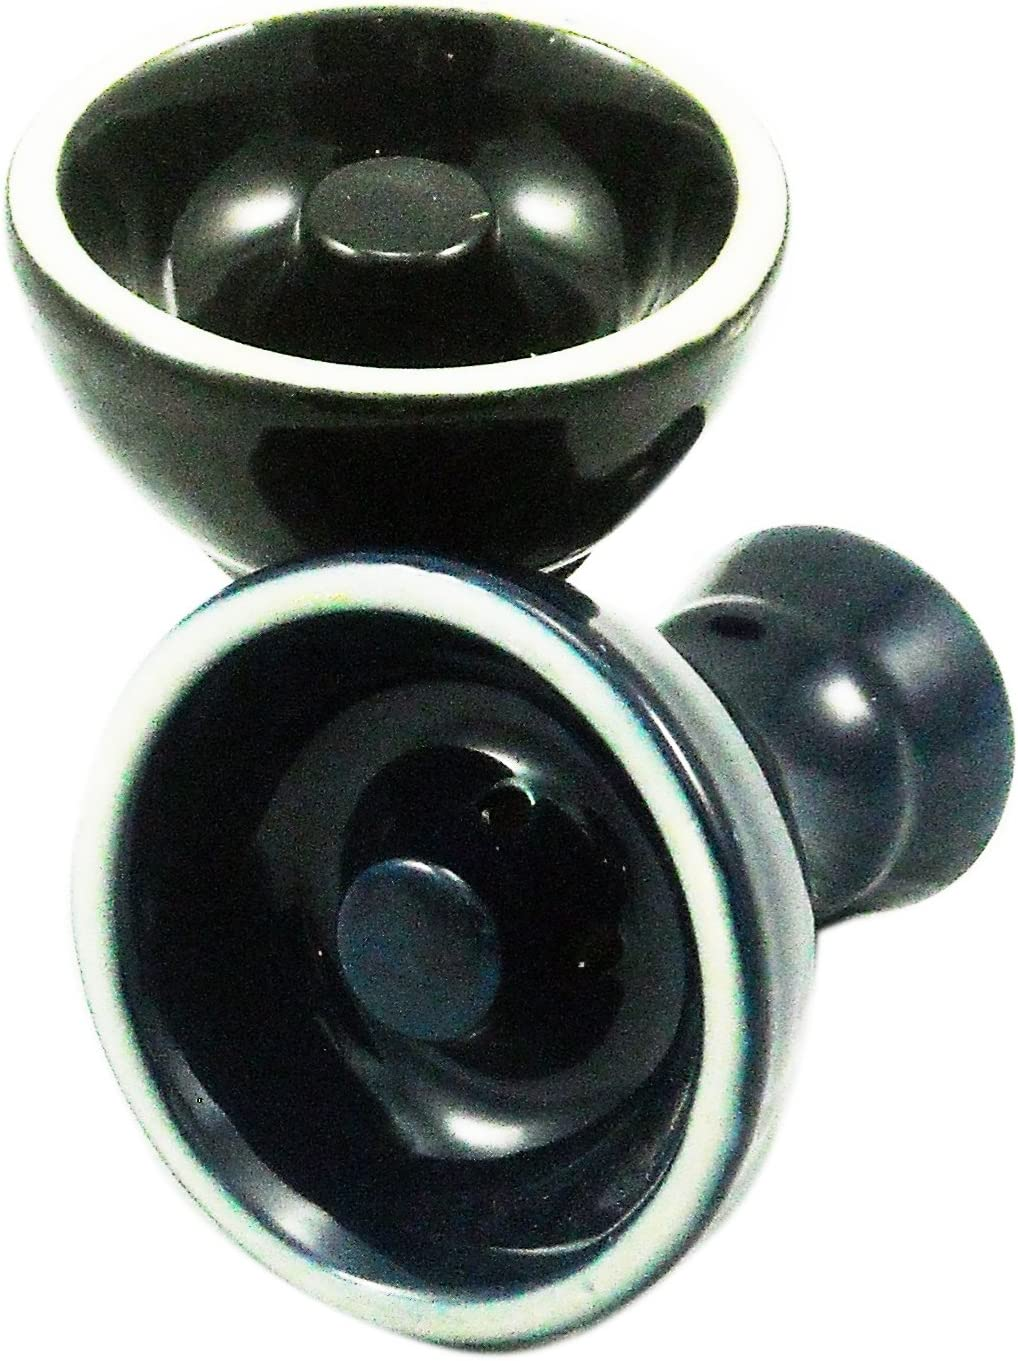 Hookah Shisha Vortex Clay Max 76% OFF Sheesha Nargila Bowl free VORTEX